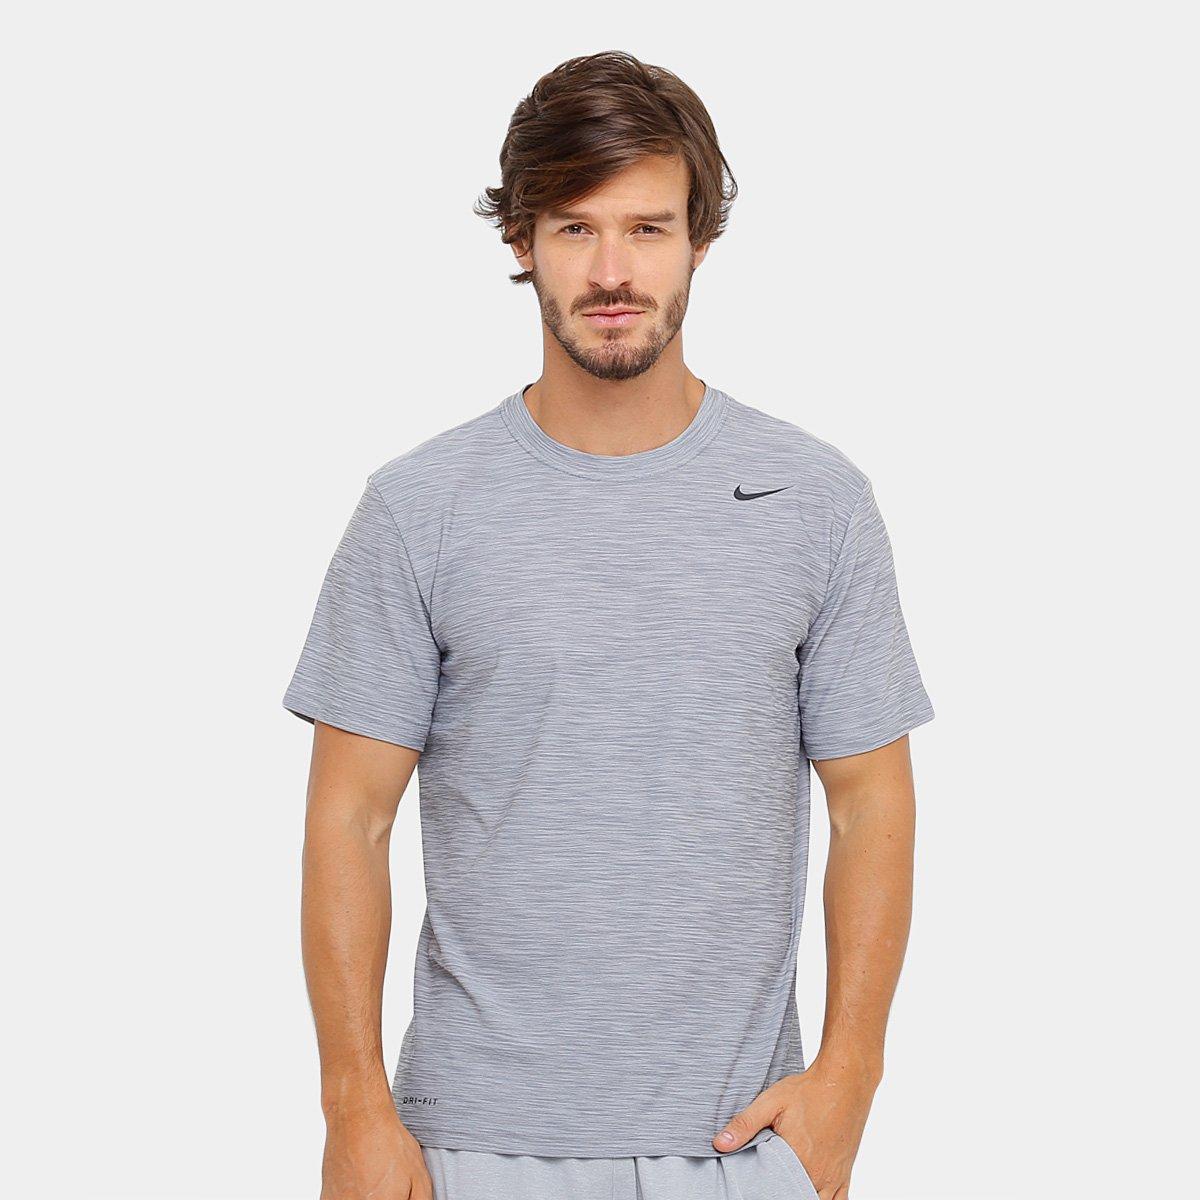 21bf1241e1 Camiseta Nike Breathe SS Dry Masculina - Prata e Preto - Compre ...